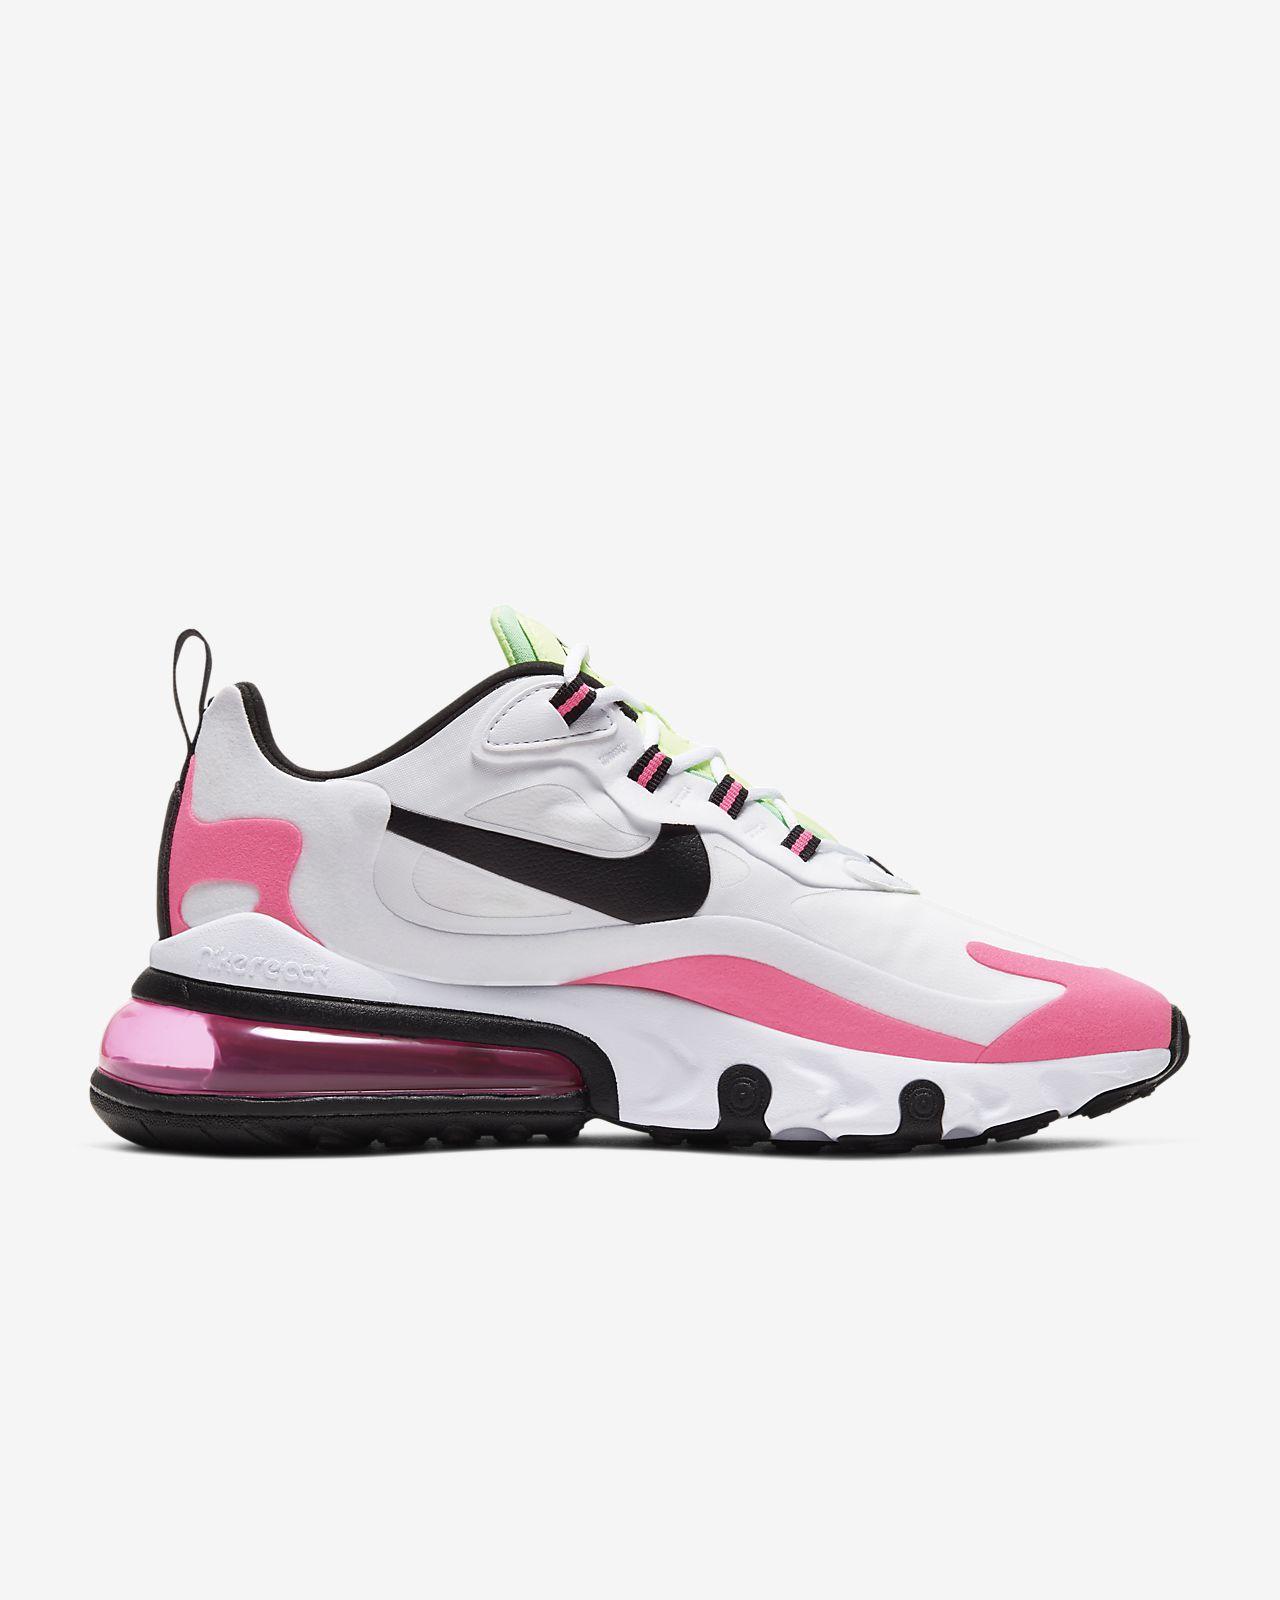 nike air max 270 pink womens running shoes